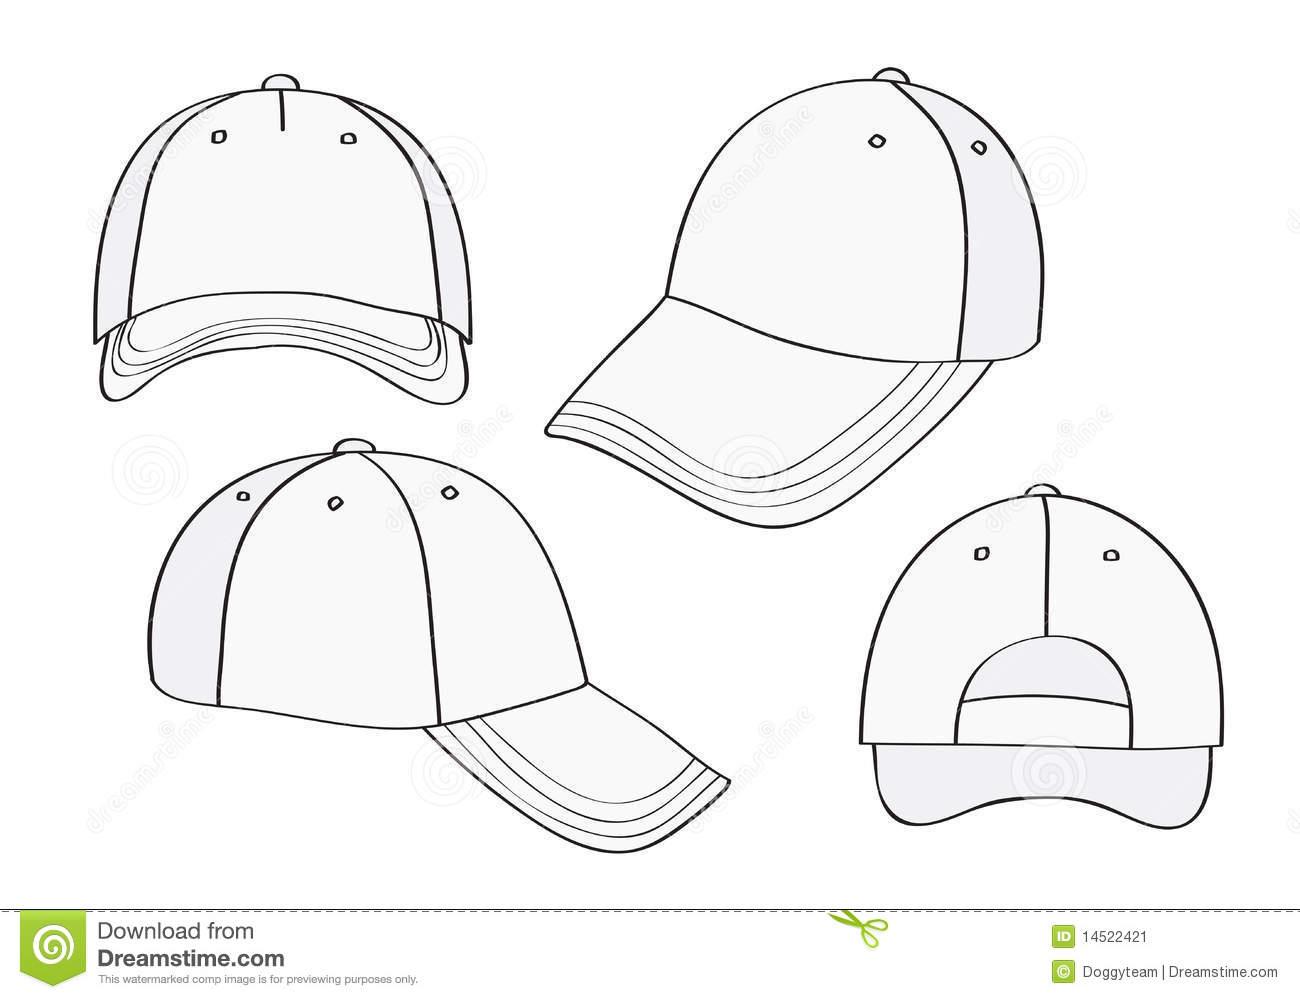 ... where to buy image richardson 7 panel trucker cap baseball hat design  template 7f50b d5d95 ... 0776783ef25